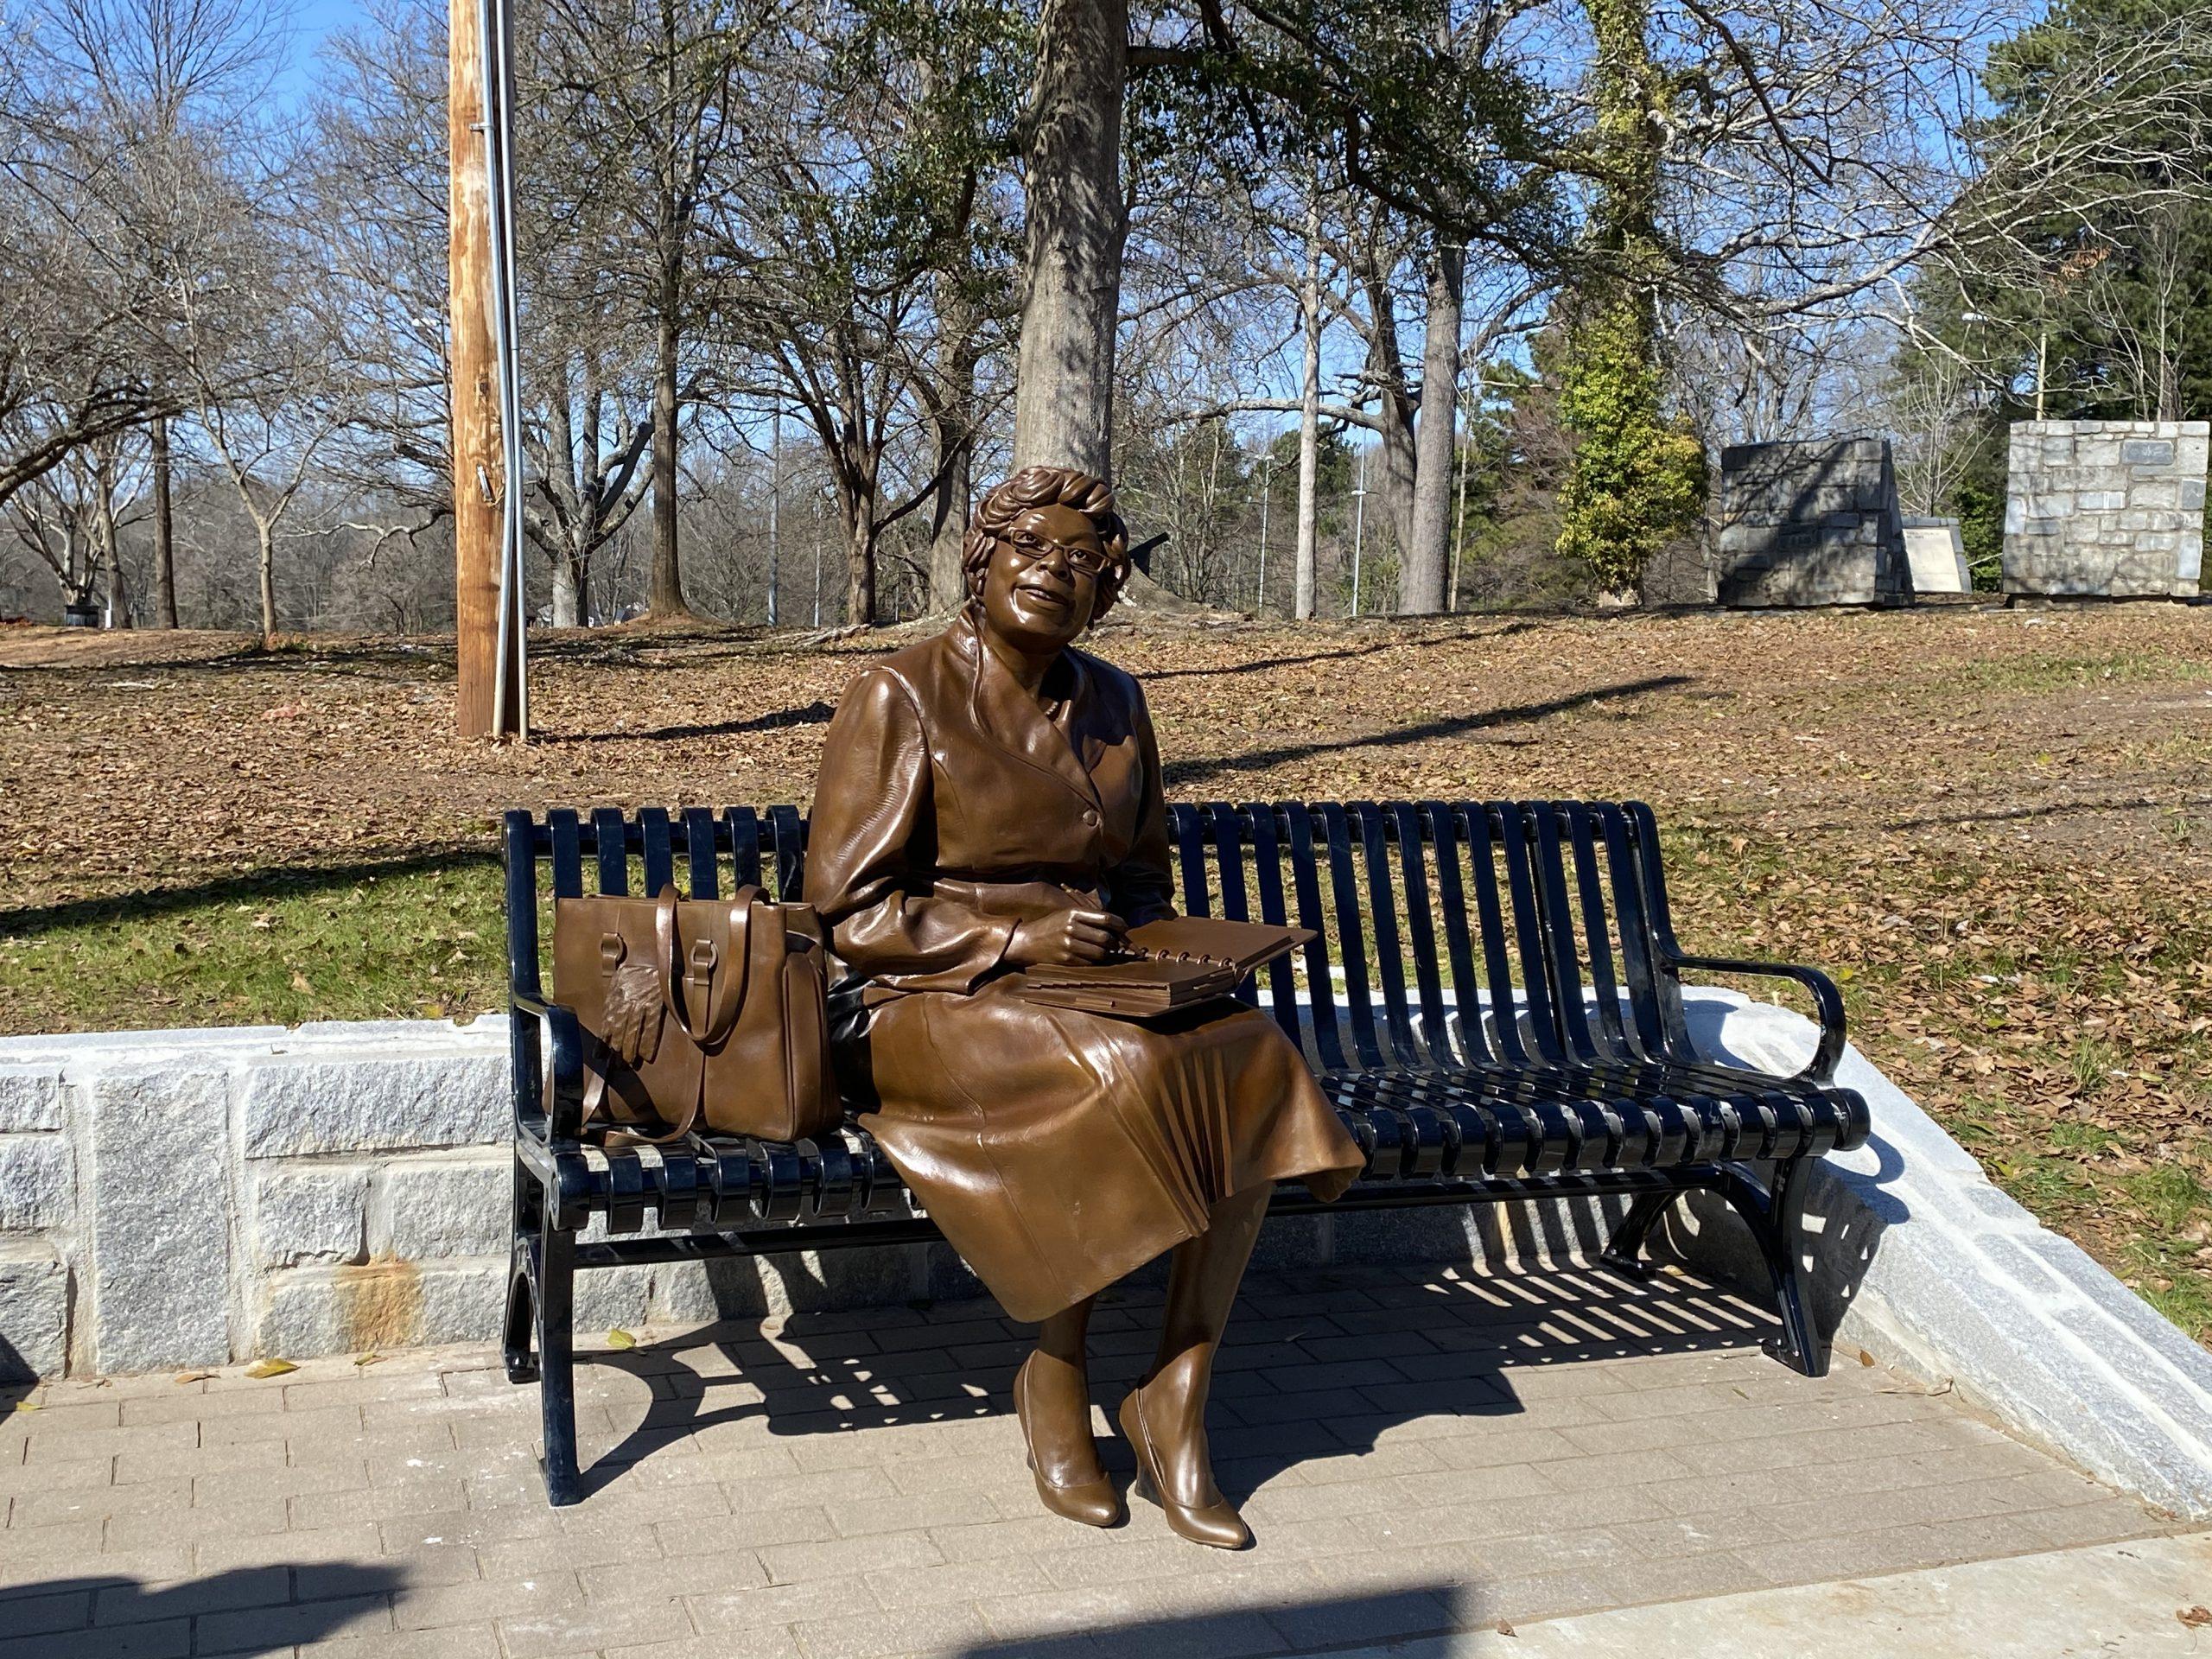 Civil Rights Heroes in Mozley Park, Atlanta